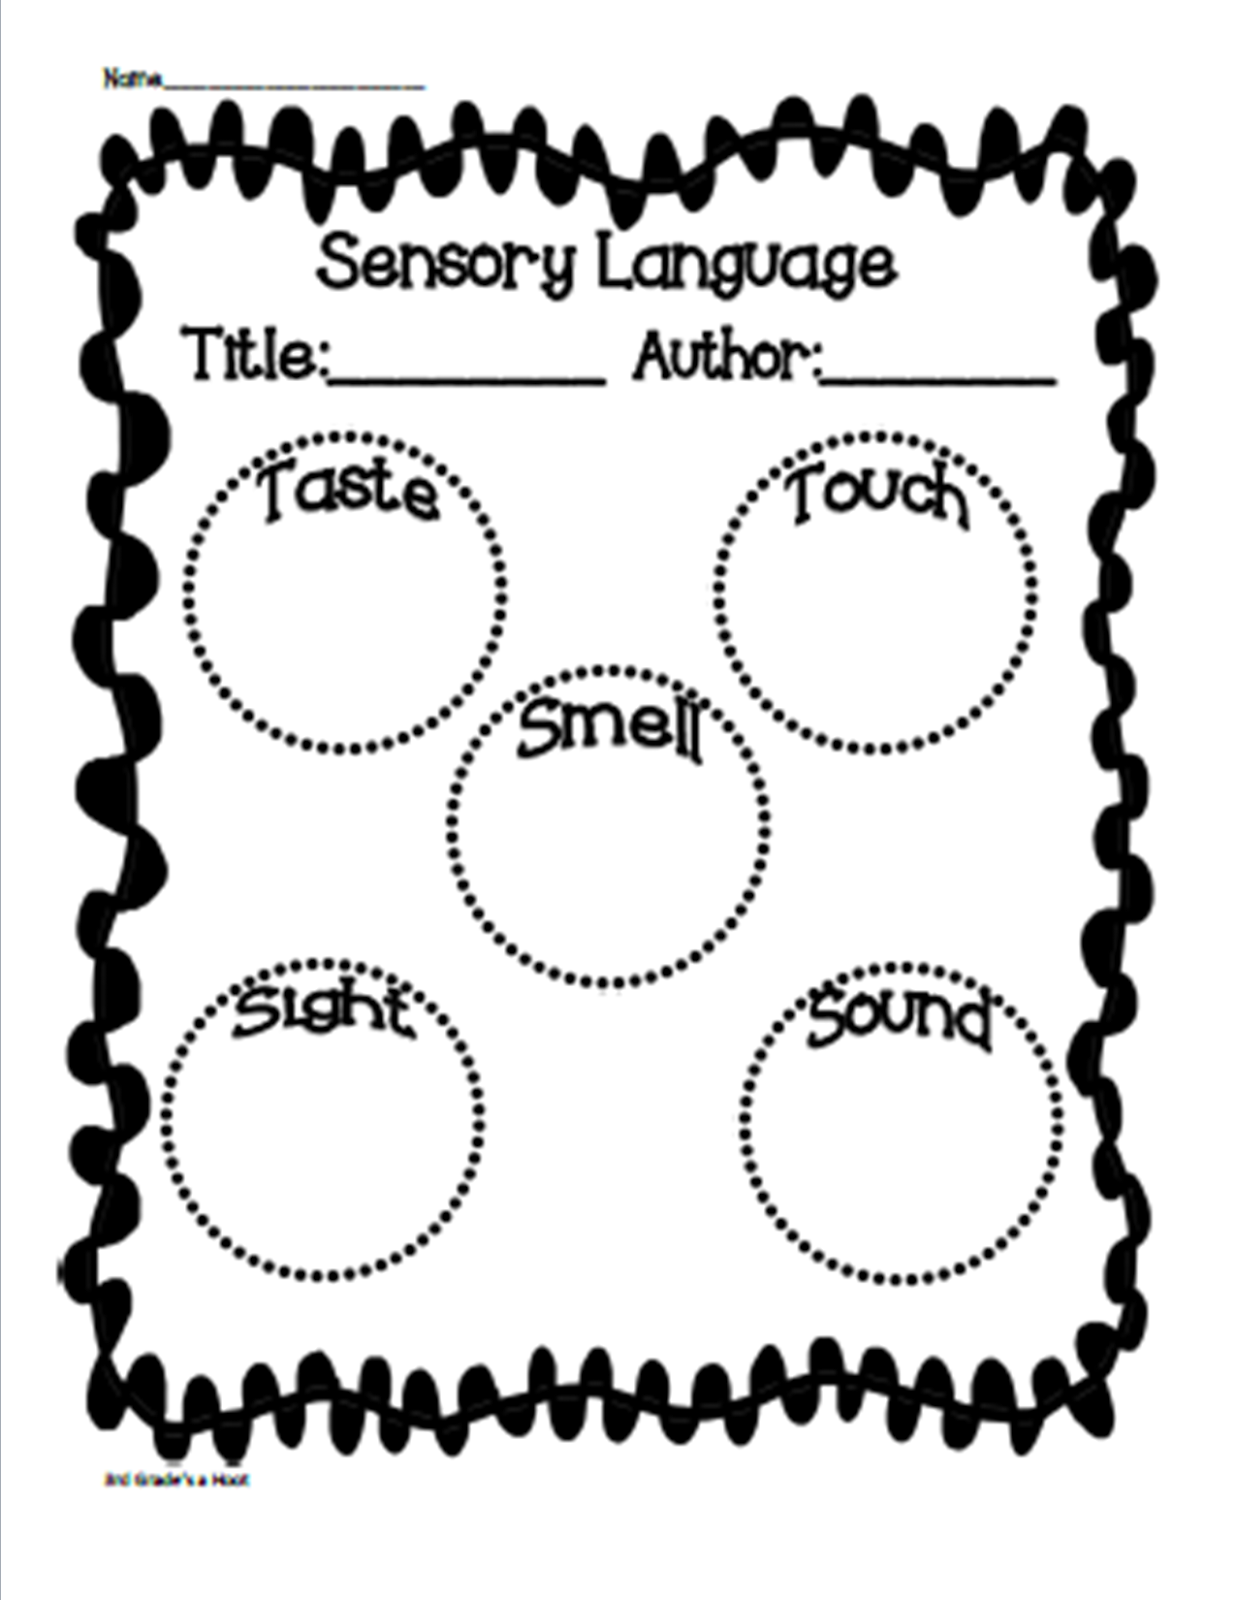 medium resolution of Sensory Language Freebie-3rd Grade's a Hoot   Graphic organizers